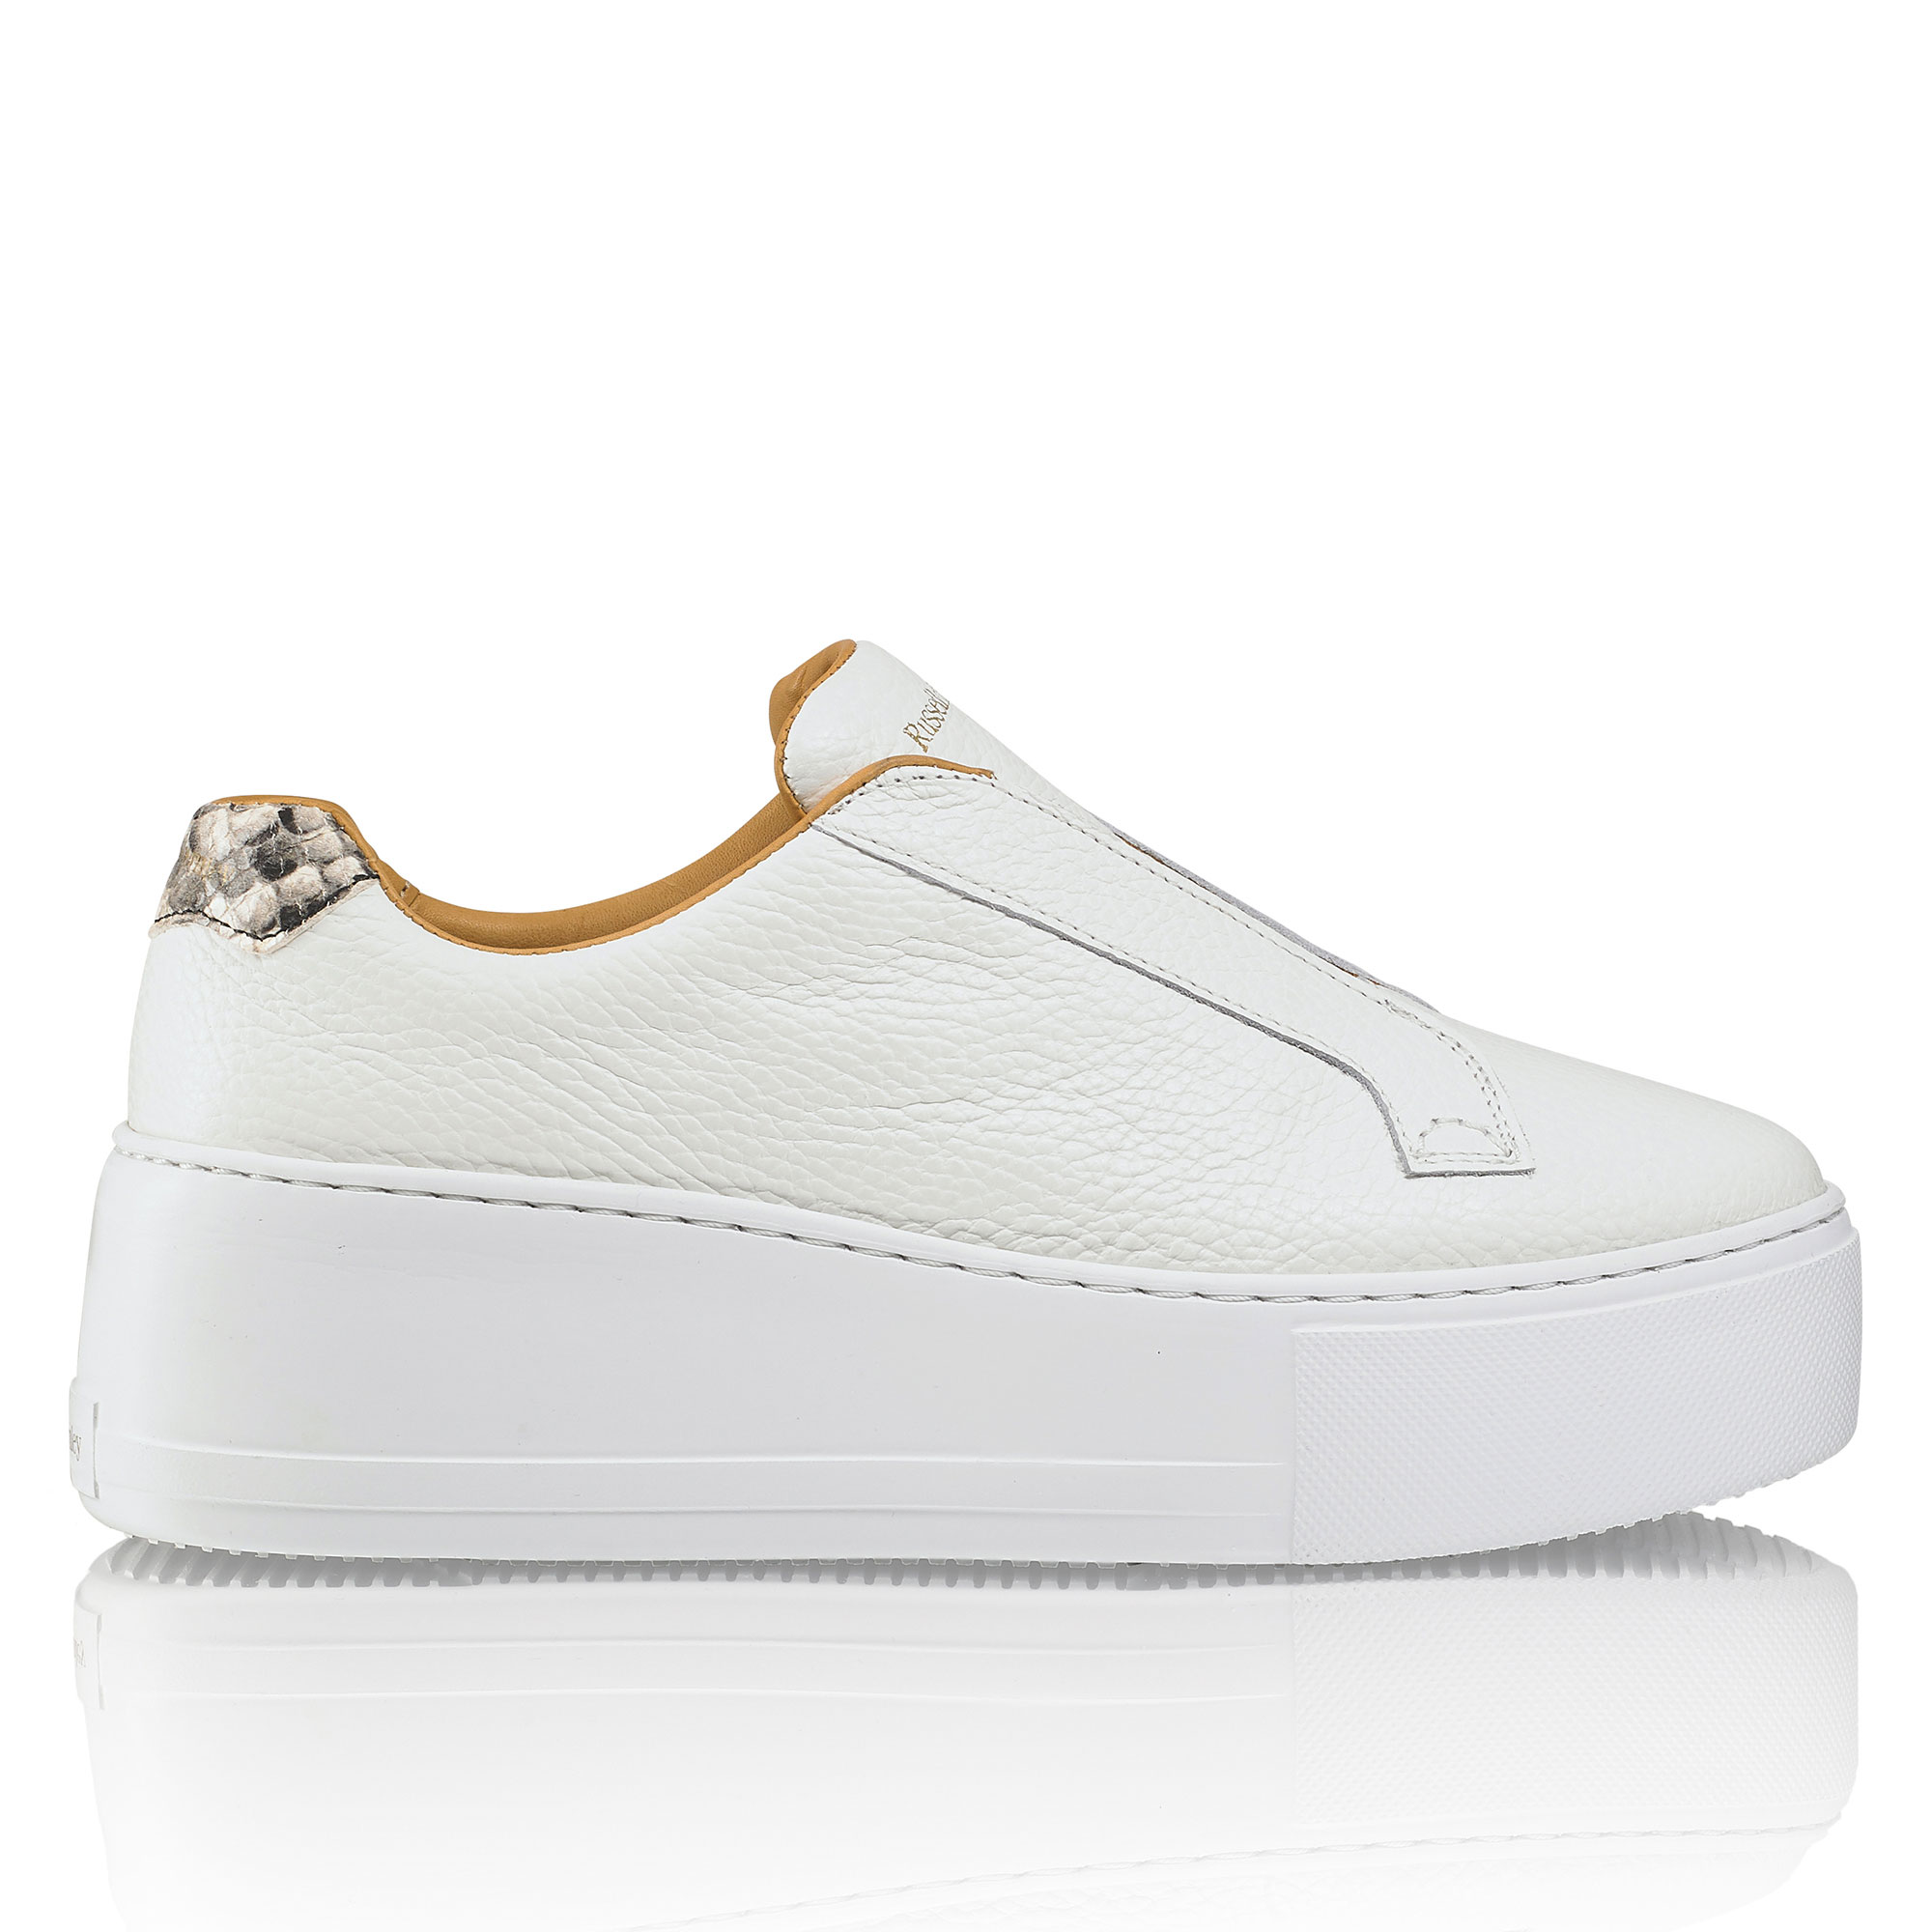 PARK UP Flatform Laceless Sneaker in